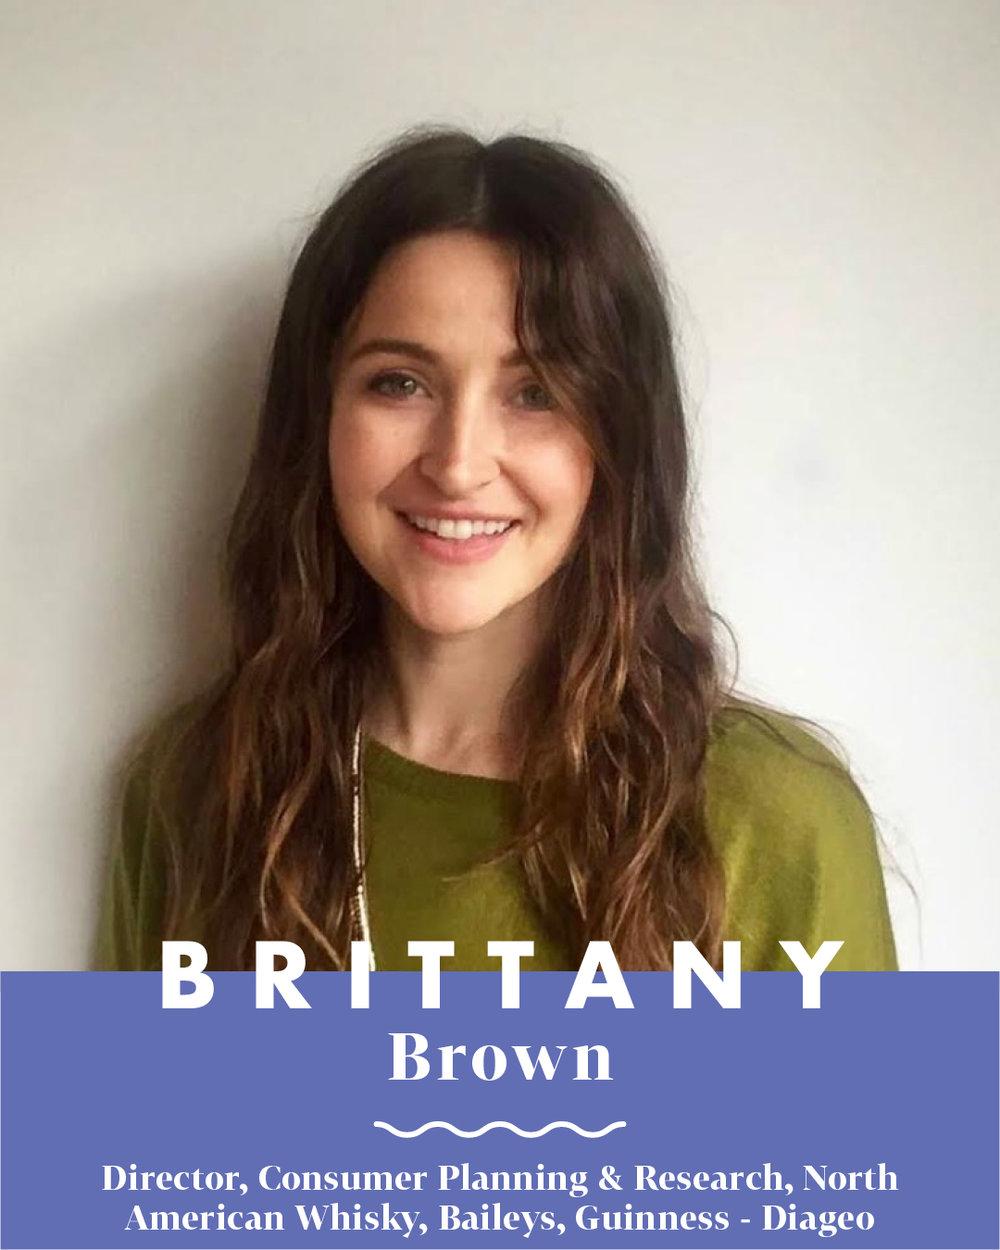 brittany-brown.jpg